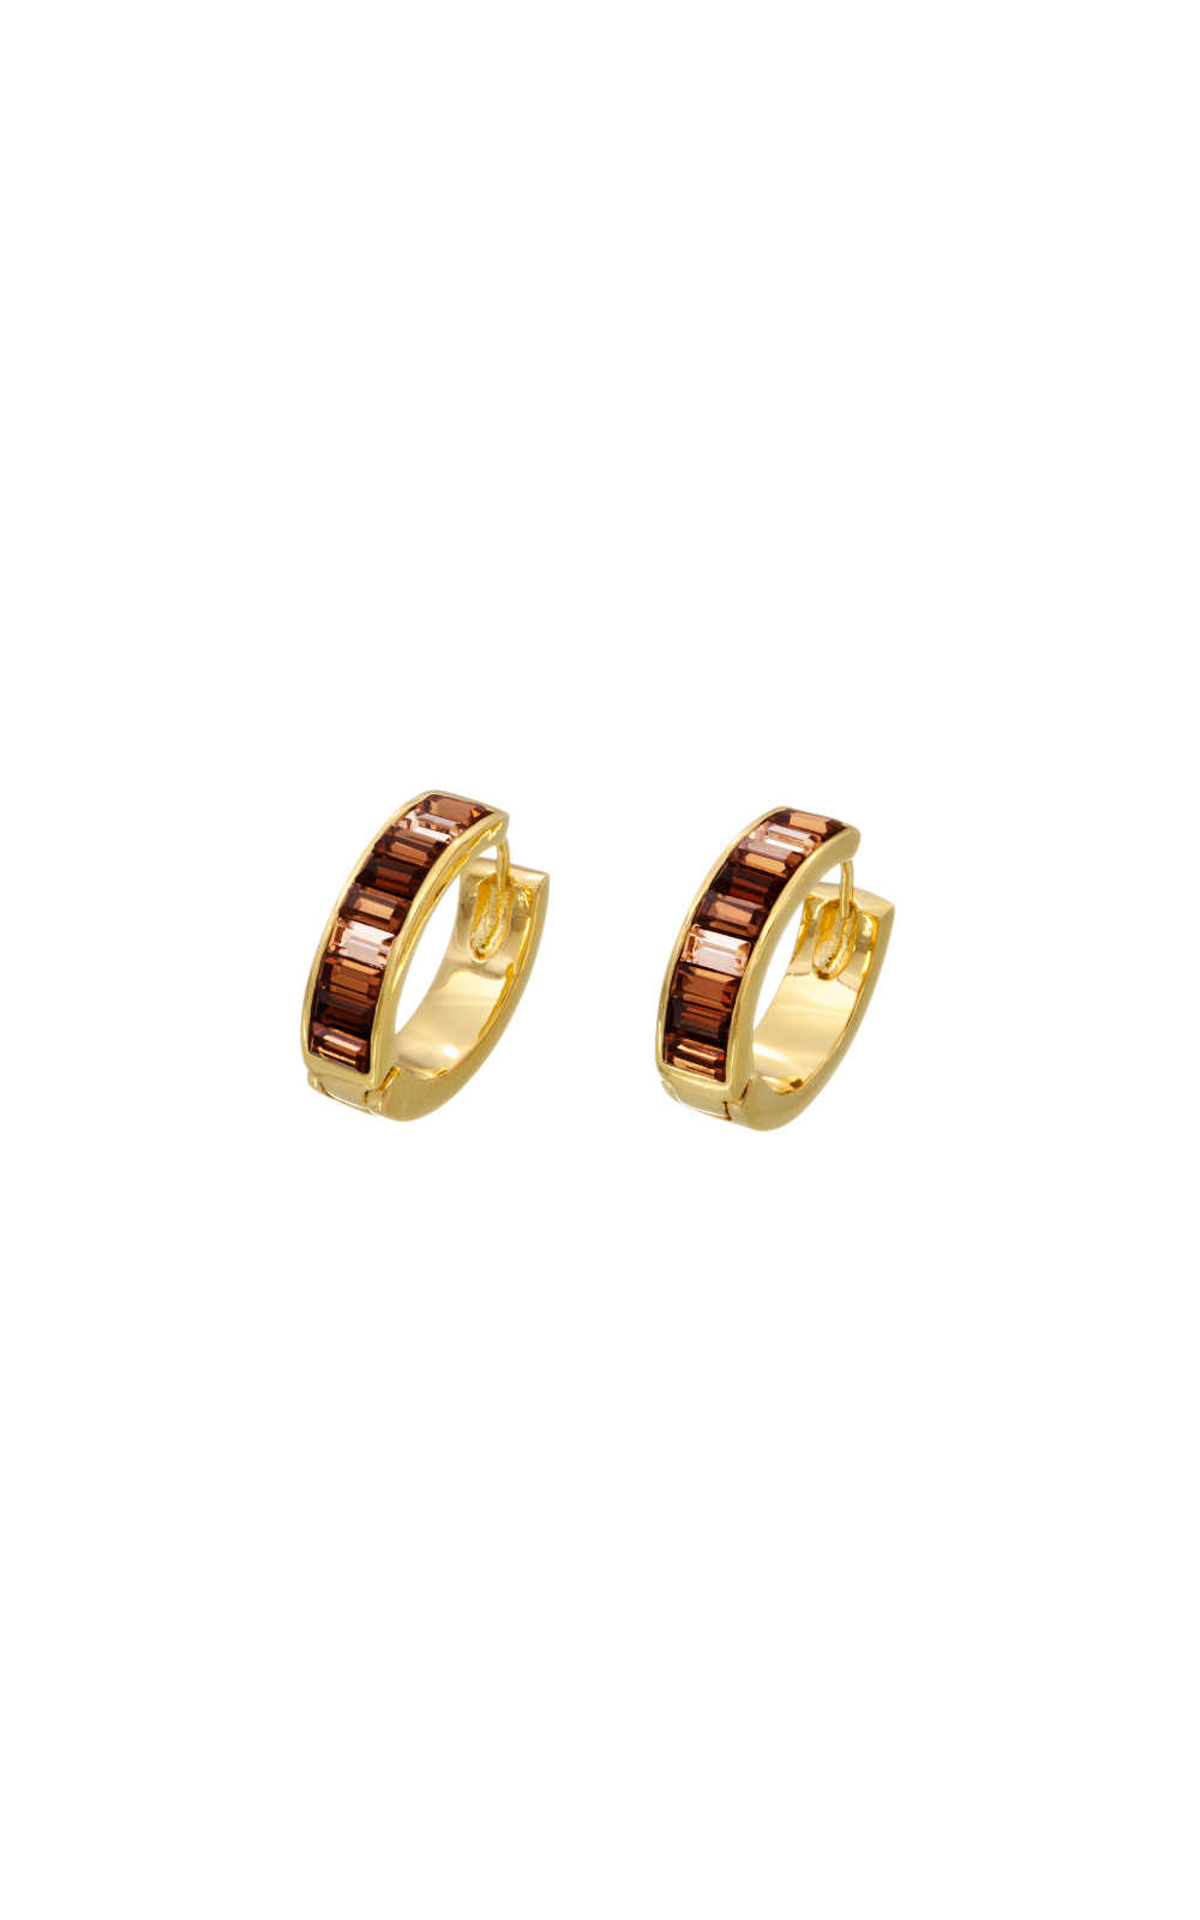 GUESS FAUX UBE51403 Χρυσά Σκουλαρίκια Με Πέτρες 4eabe576981